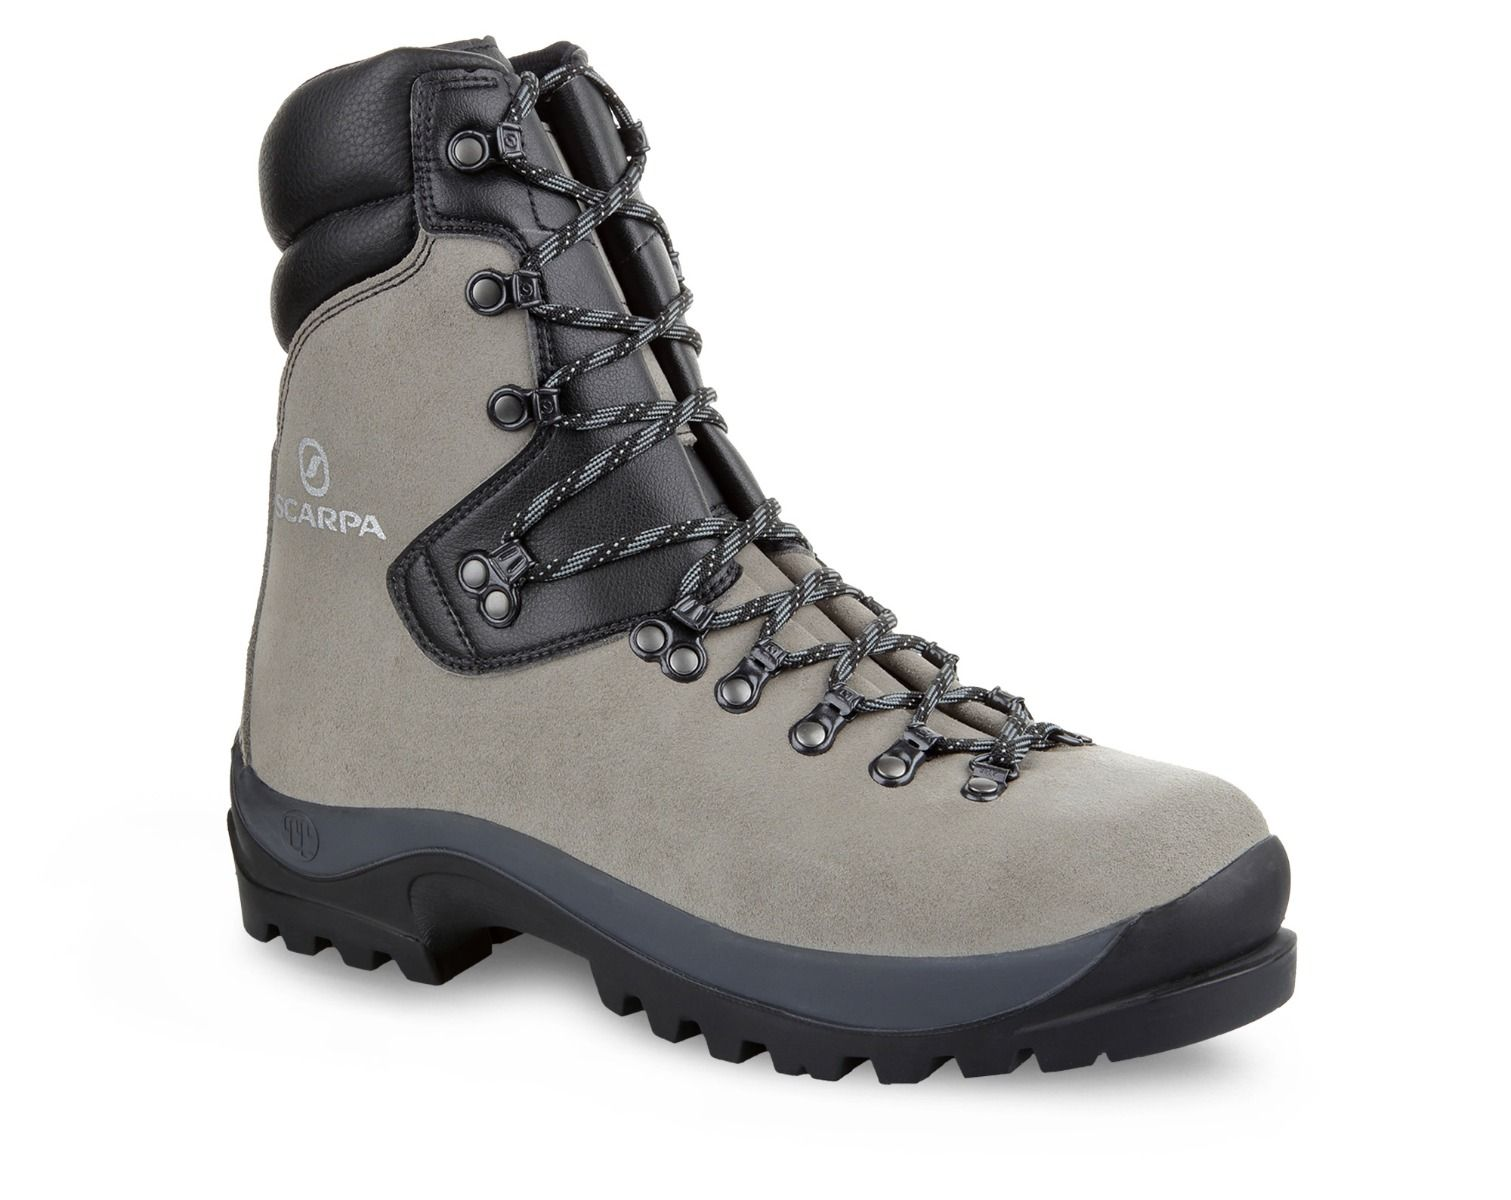 f5faa52652f Scarpa Wrangell GTX Backpacking Boots - Men's